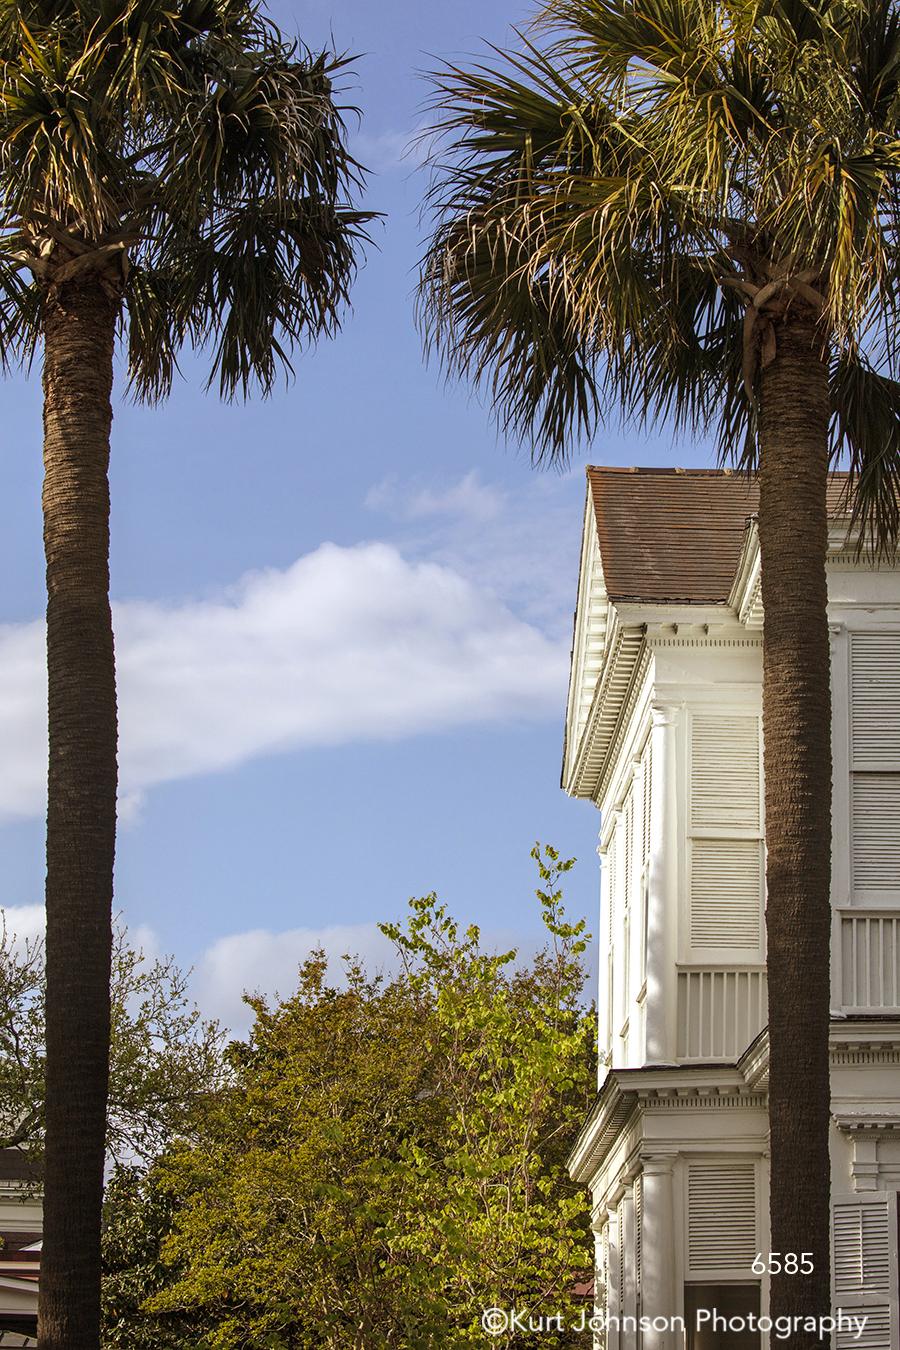 southeast Charleston South Carolina green palm trees blue sky architecture building city